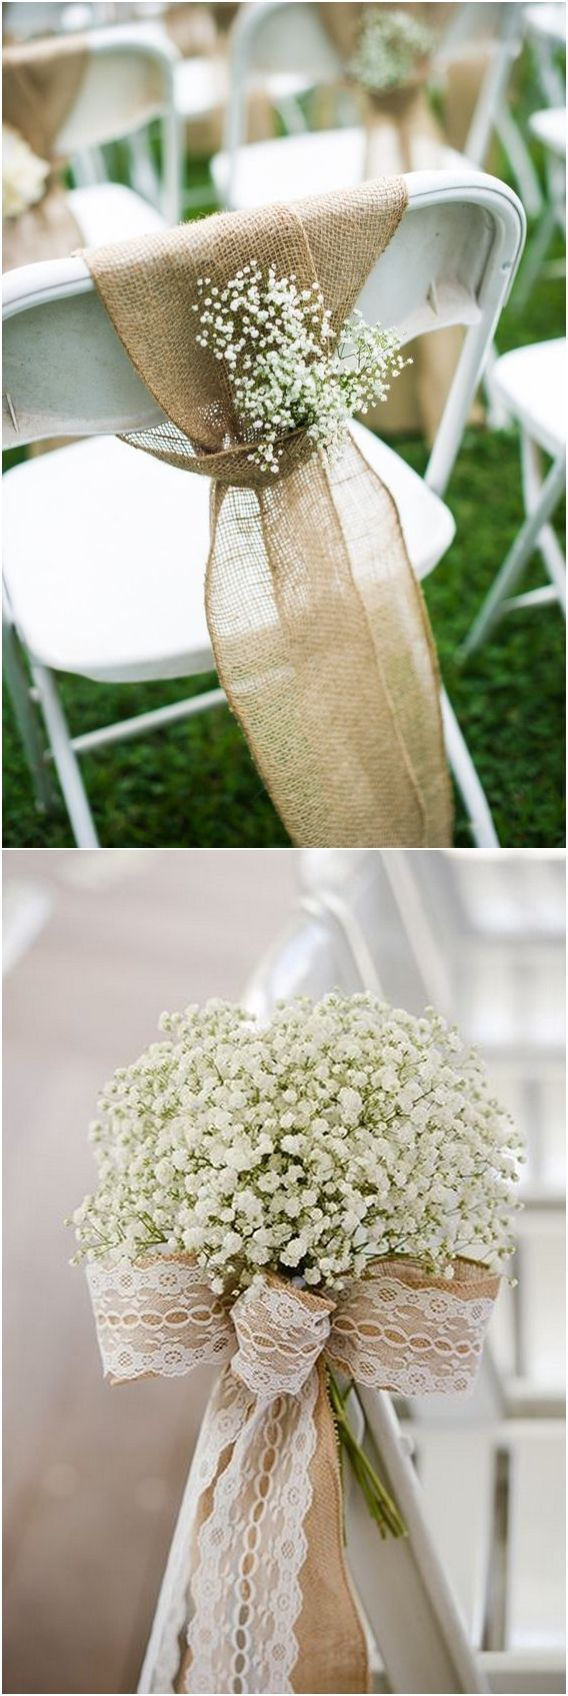 Rustic baby's breath wedding chair decor ideas #wedding #weddingideas #weddinginspiration #countryweddings – Mariline LP